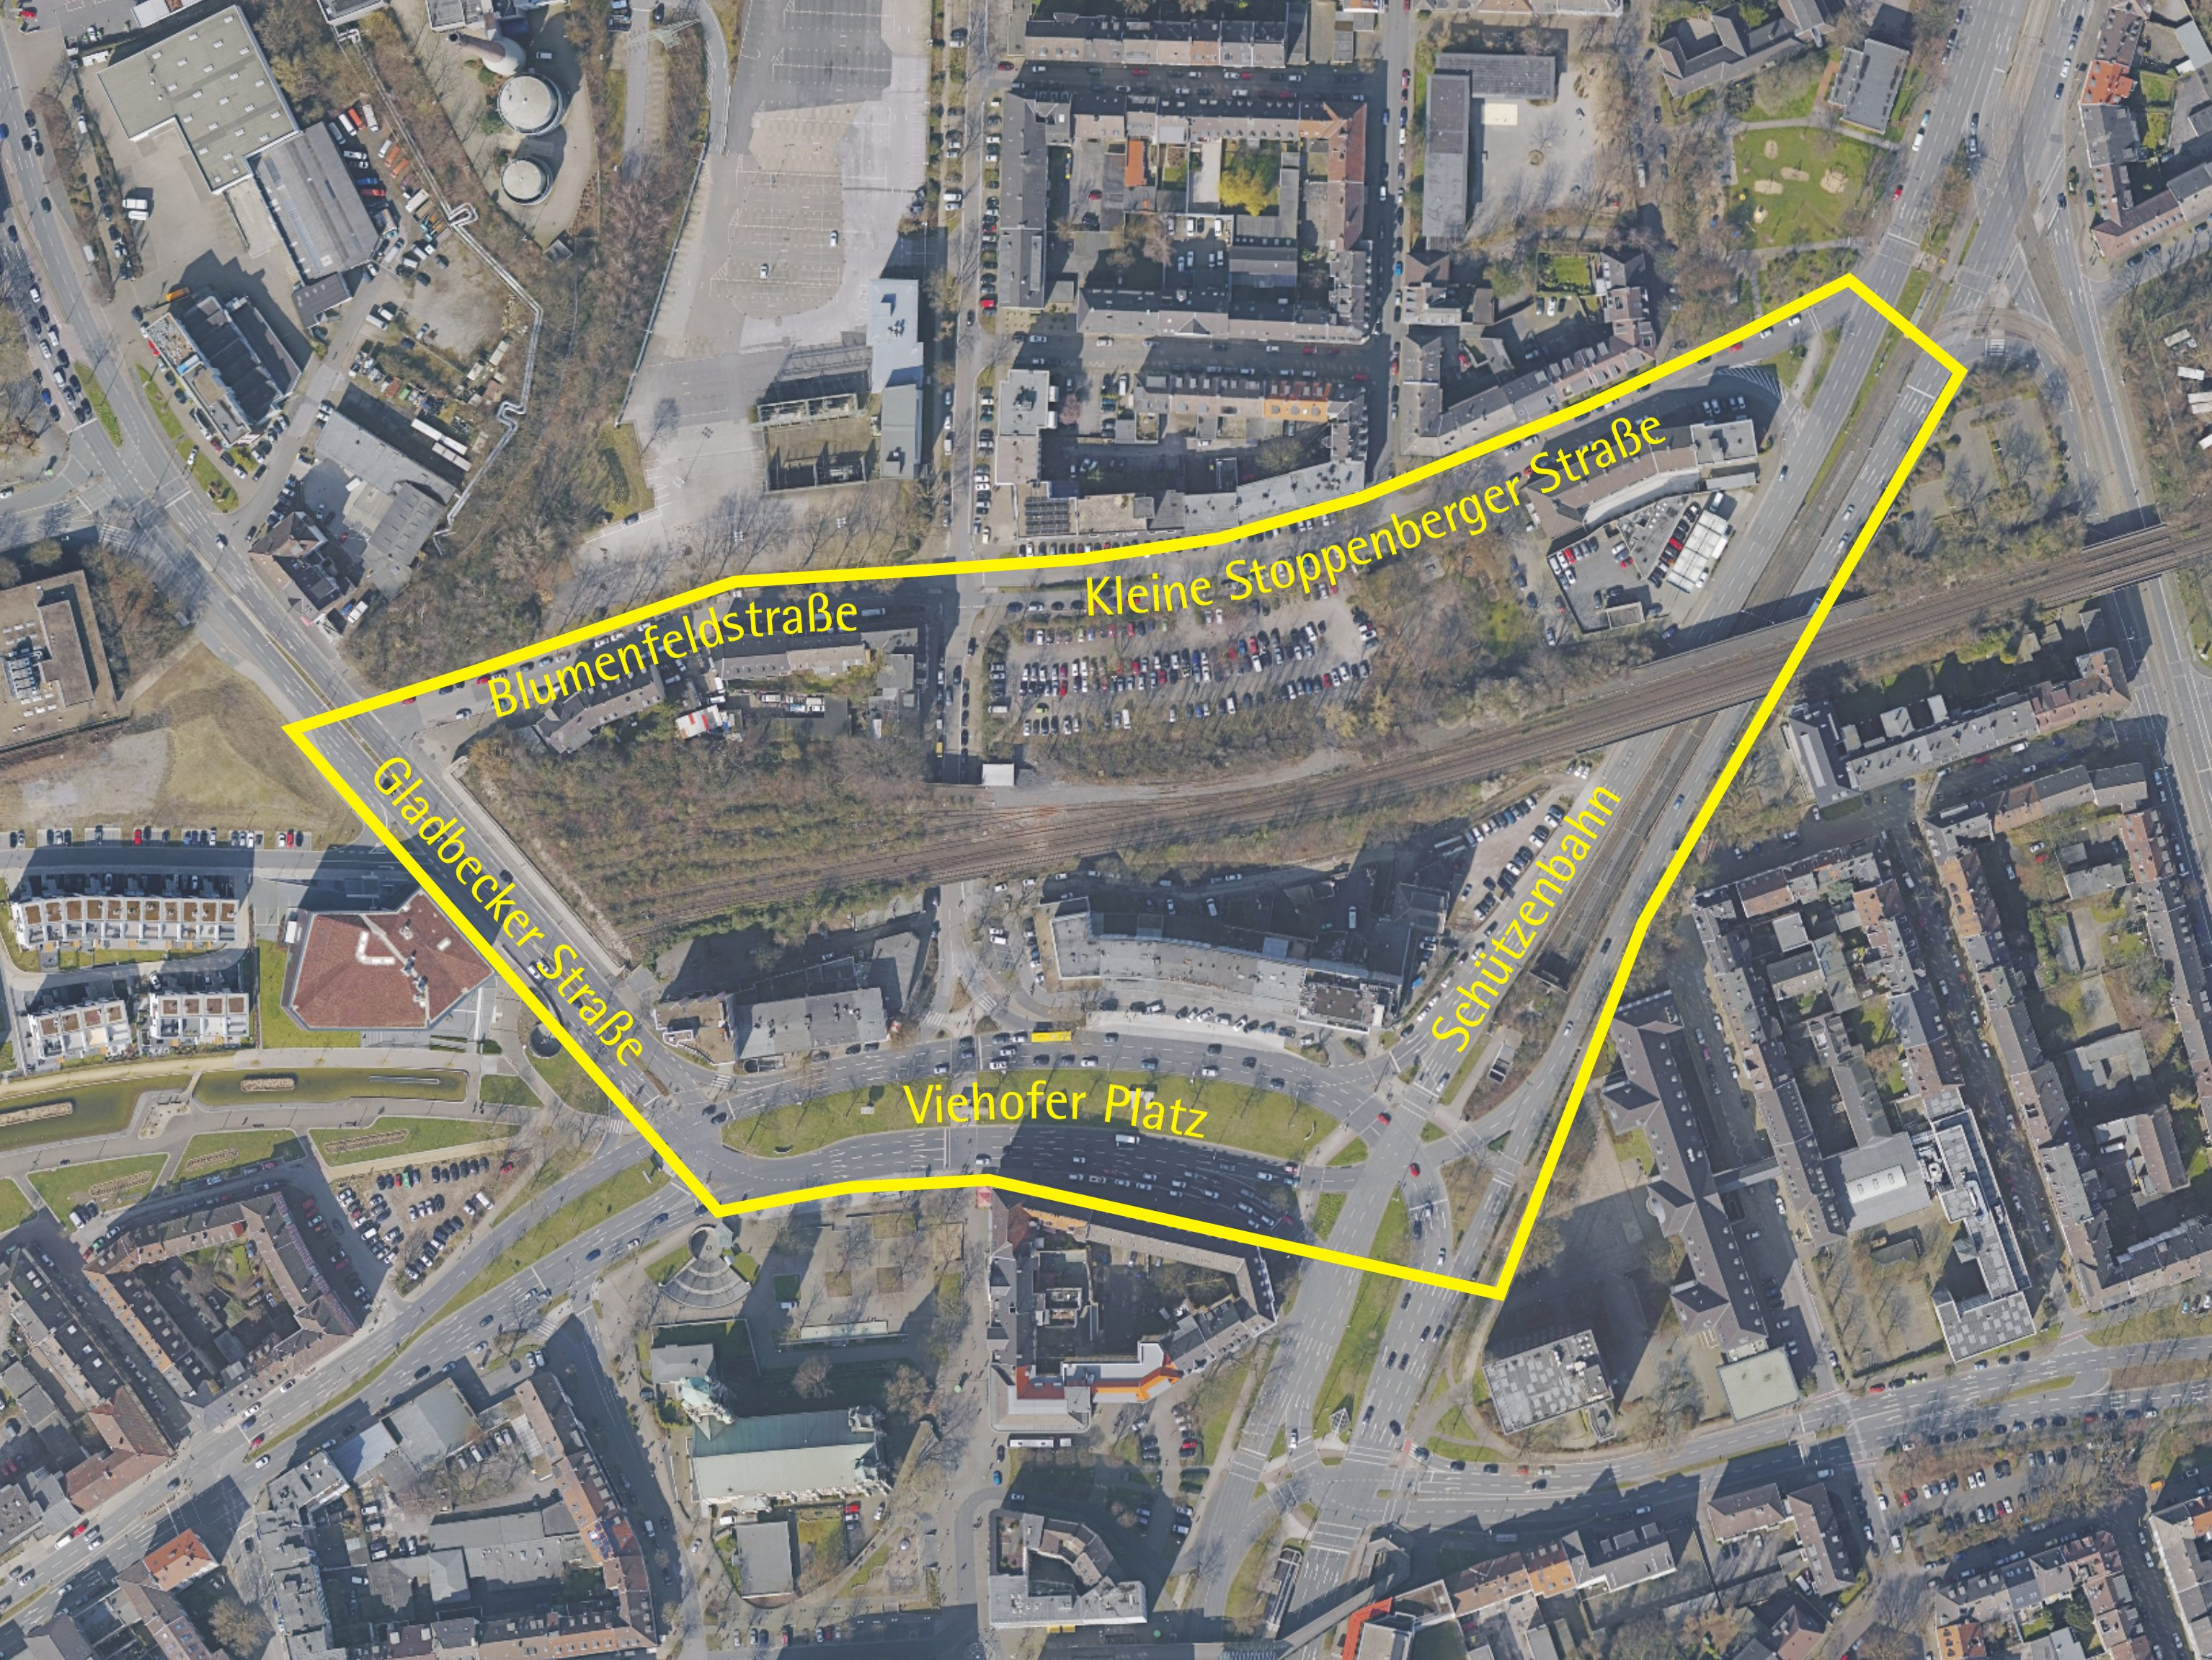 Luftbild: Eltingviertel/Viehofer Platz